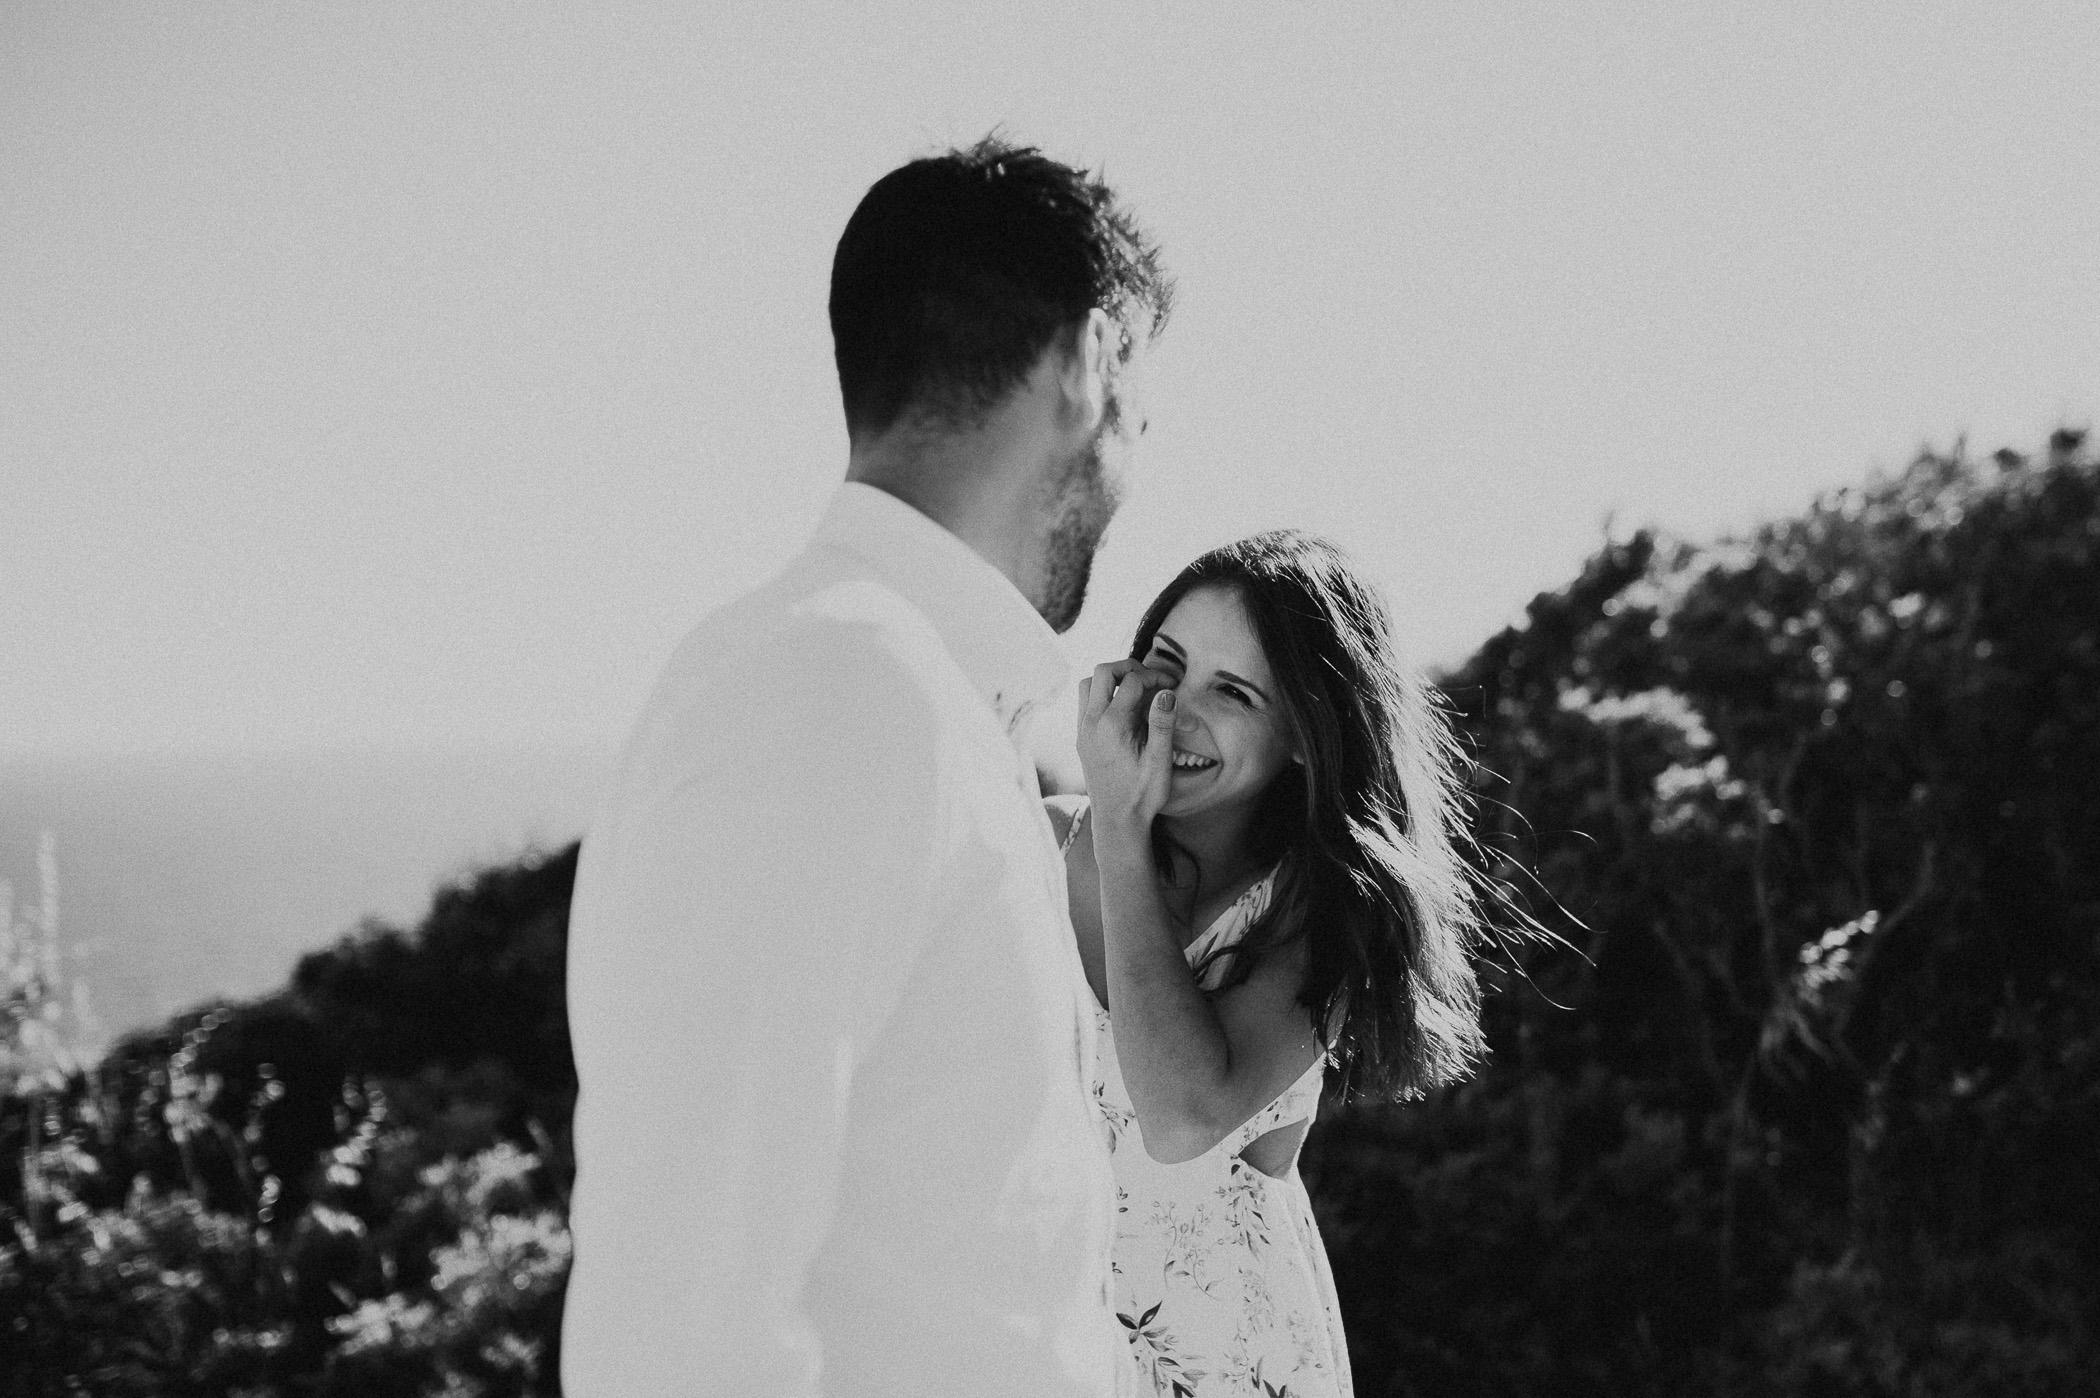 DanielaMarquardtPhotography_wedding_elopement_mallorca_spain_calapi_palma_lauraandtoni_43